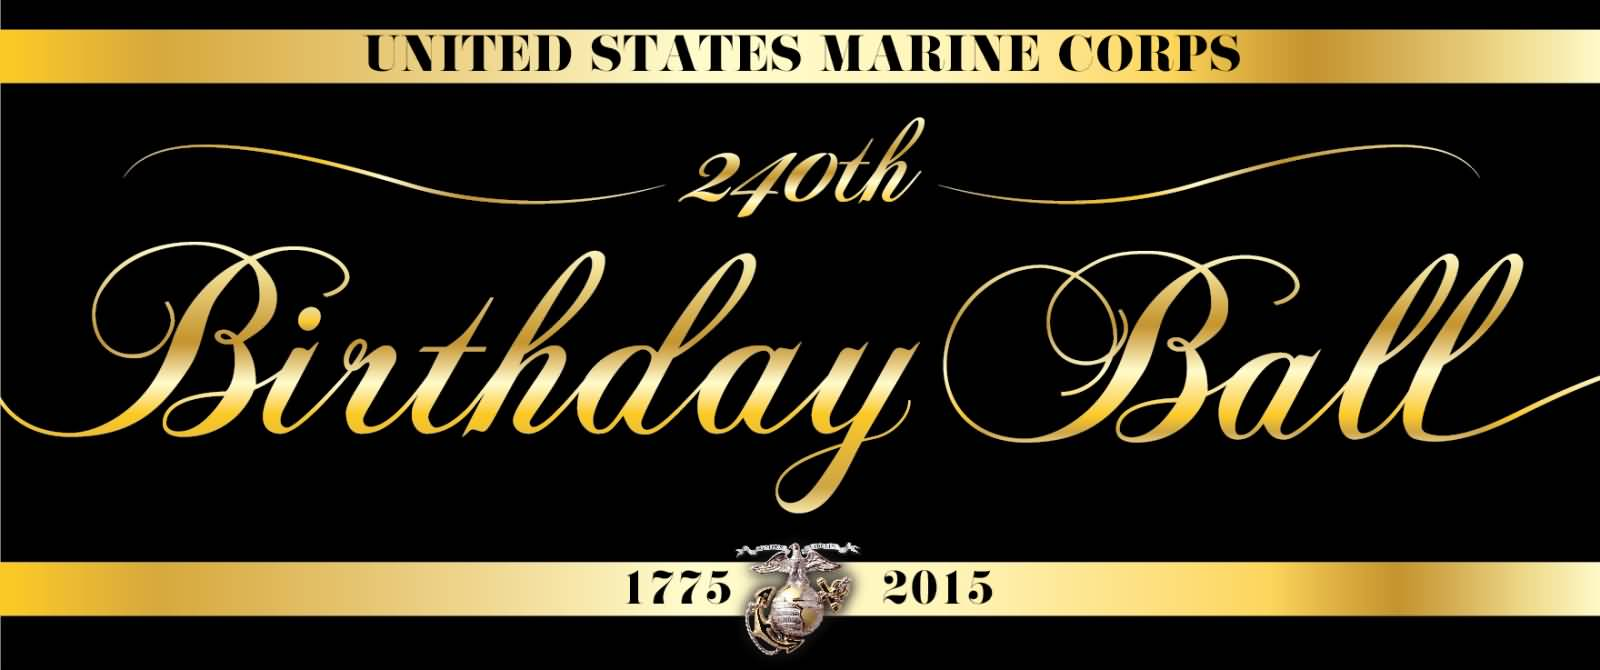 25 beautiful marine corps birthday wish pictures and images united states marine corps birthday ball m4hsunfo